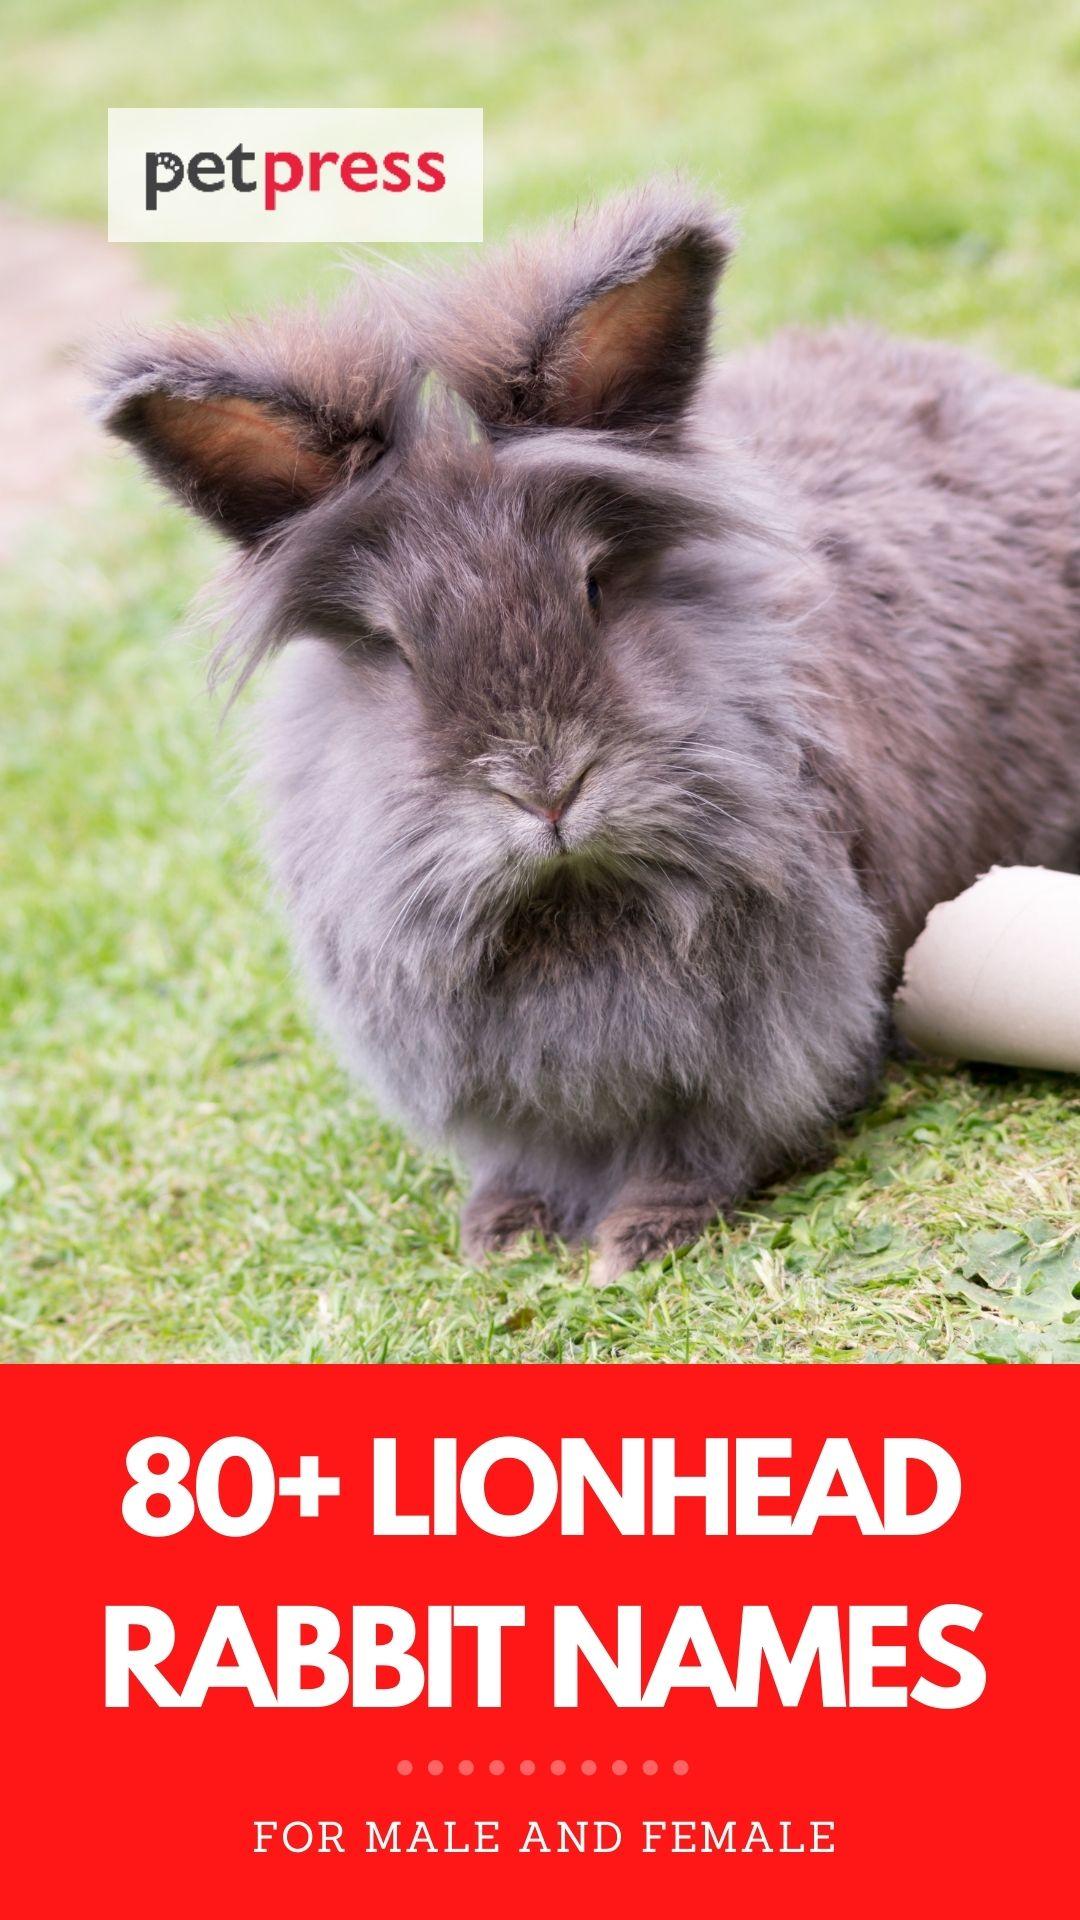 lionhead rabbit names